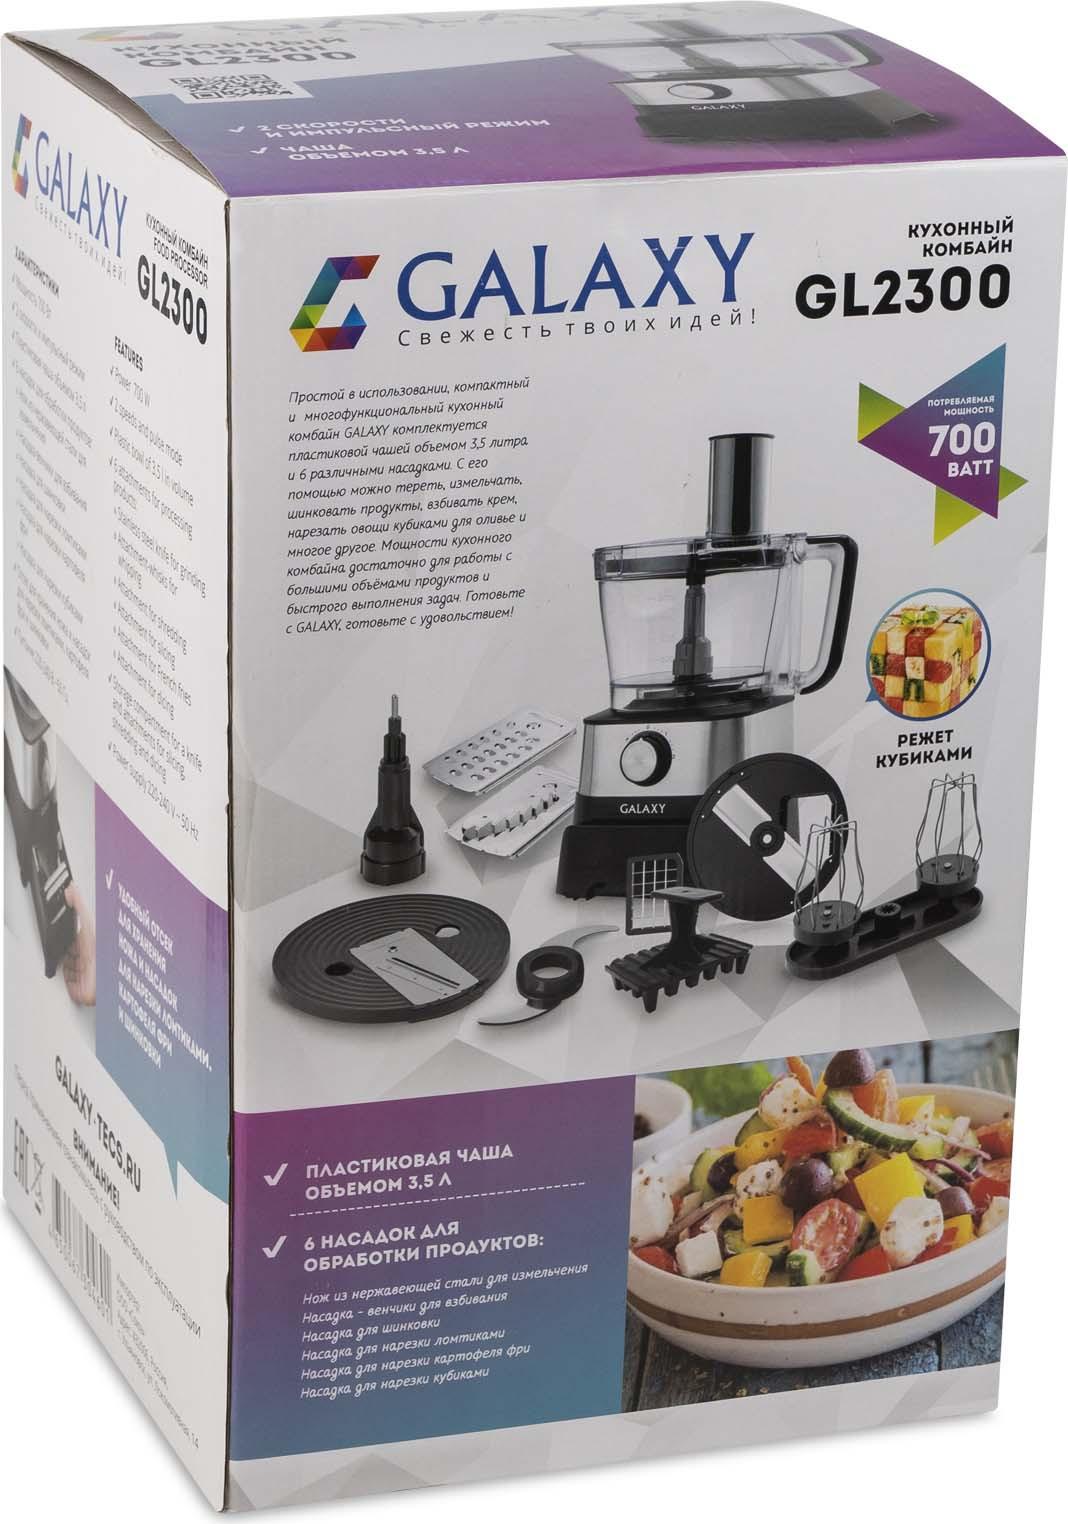 Кухонный комбайн Galaxy GL 2300, цвет: черный, серебристый Galaxy